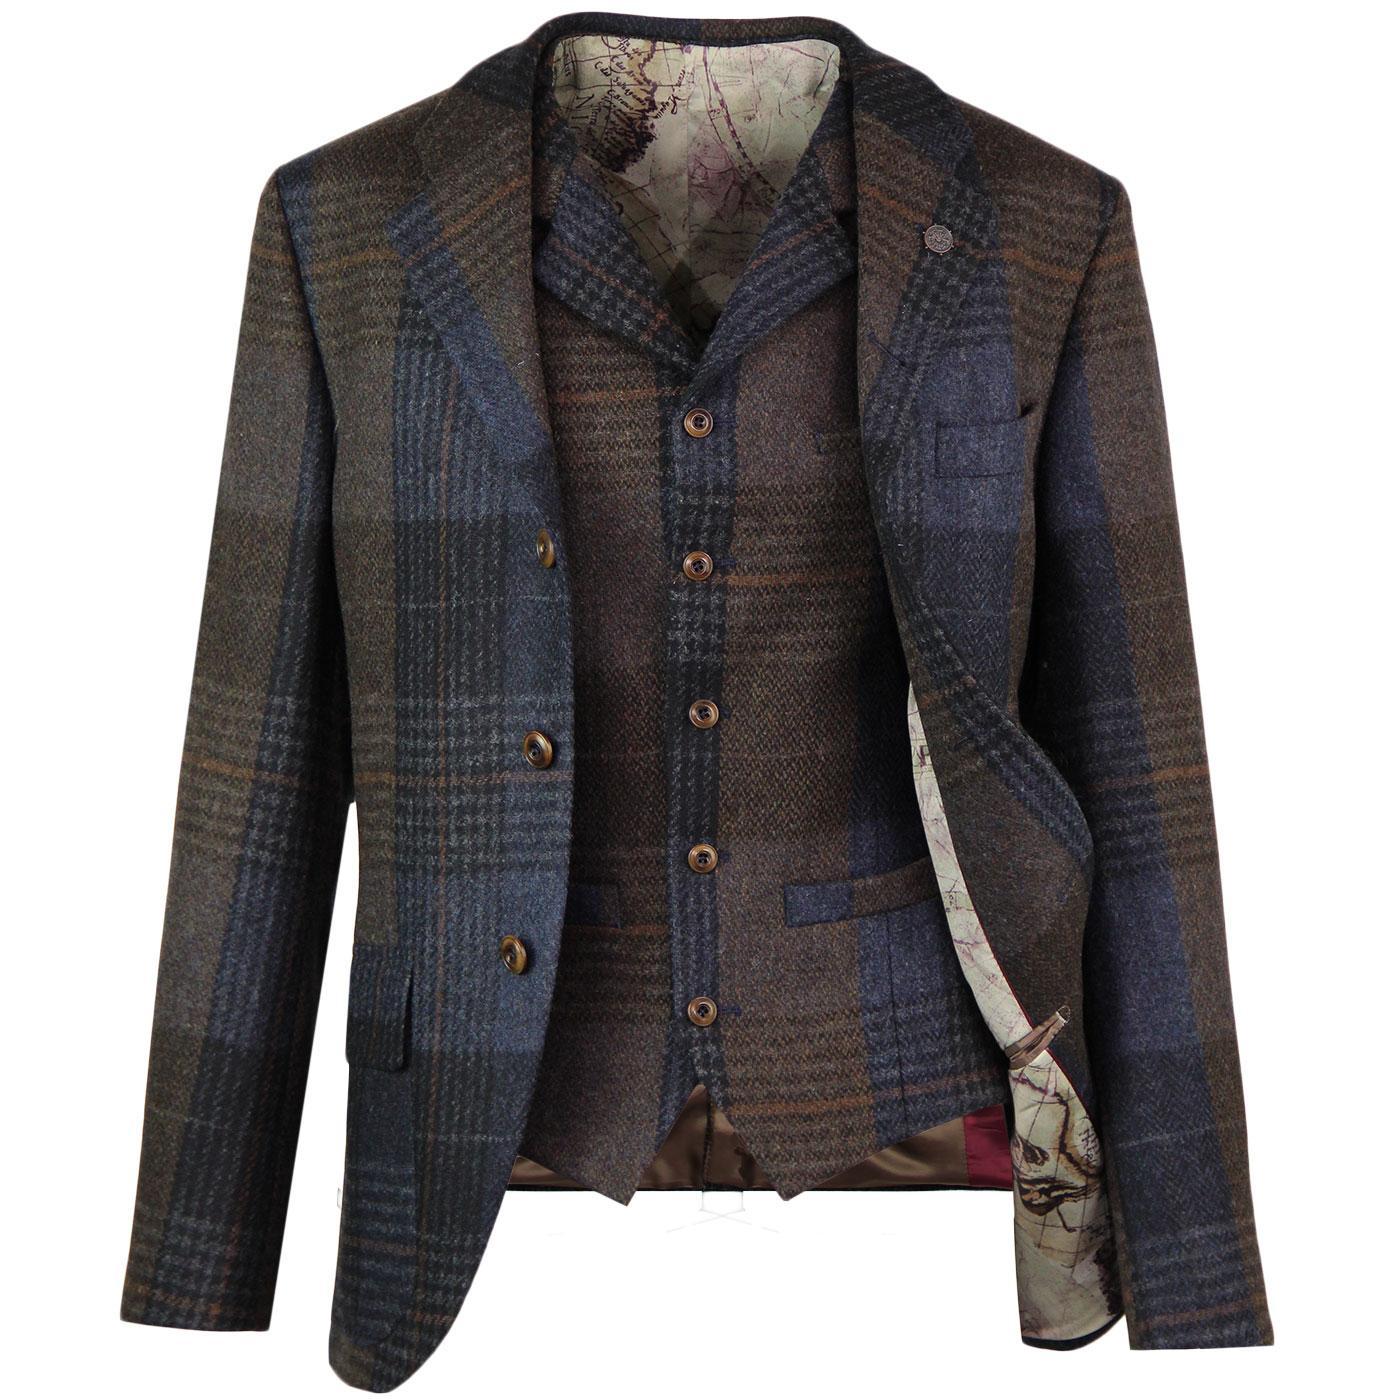 Grouse GIBSON LONDON Mod Check Blazer & Waistcoat